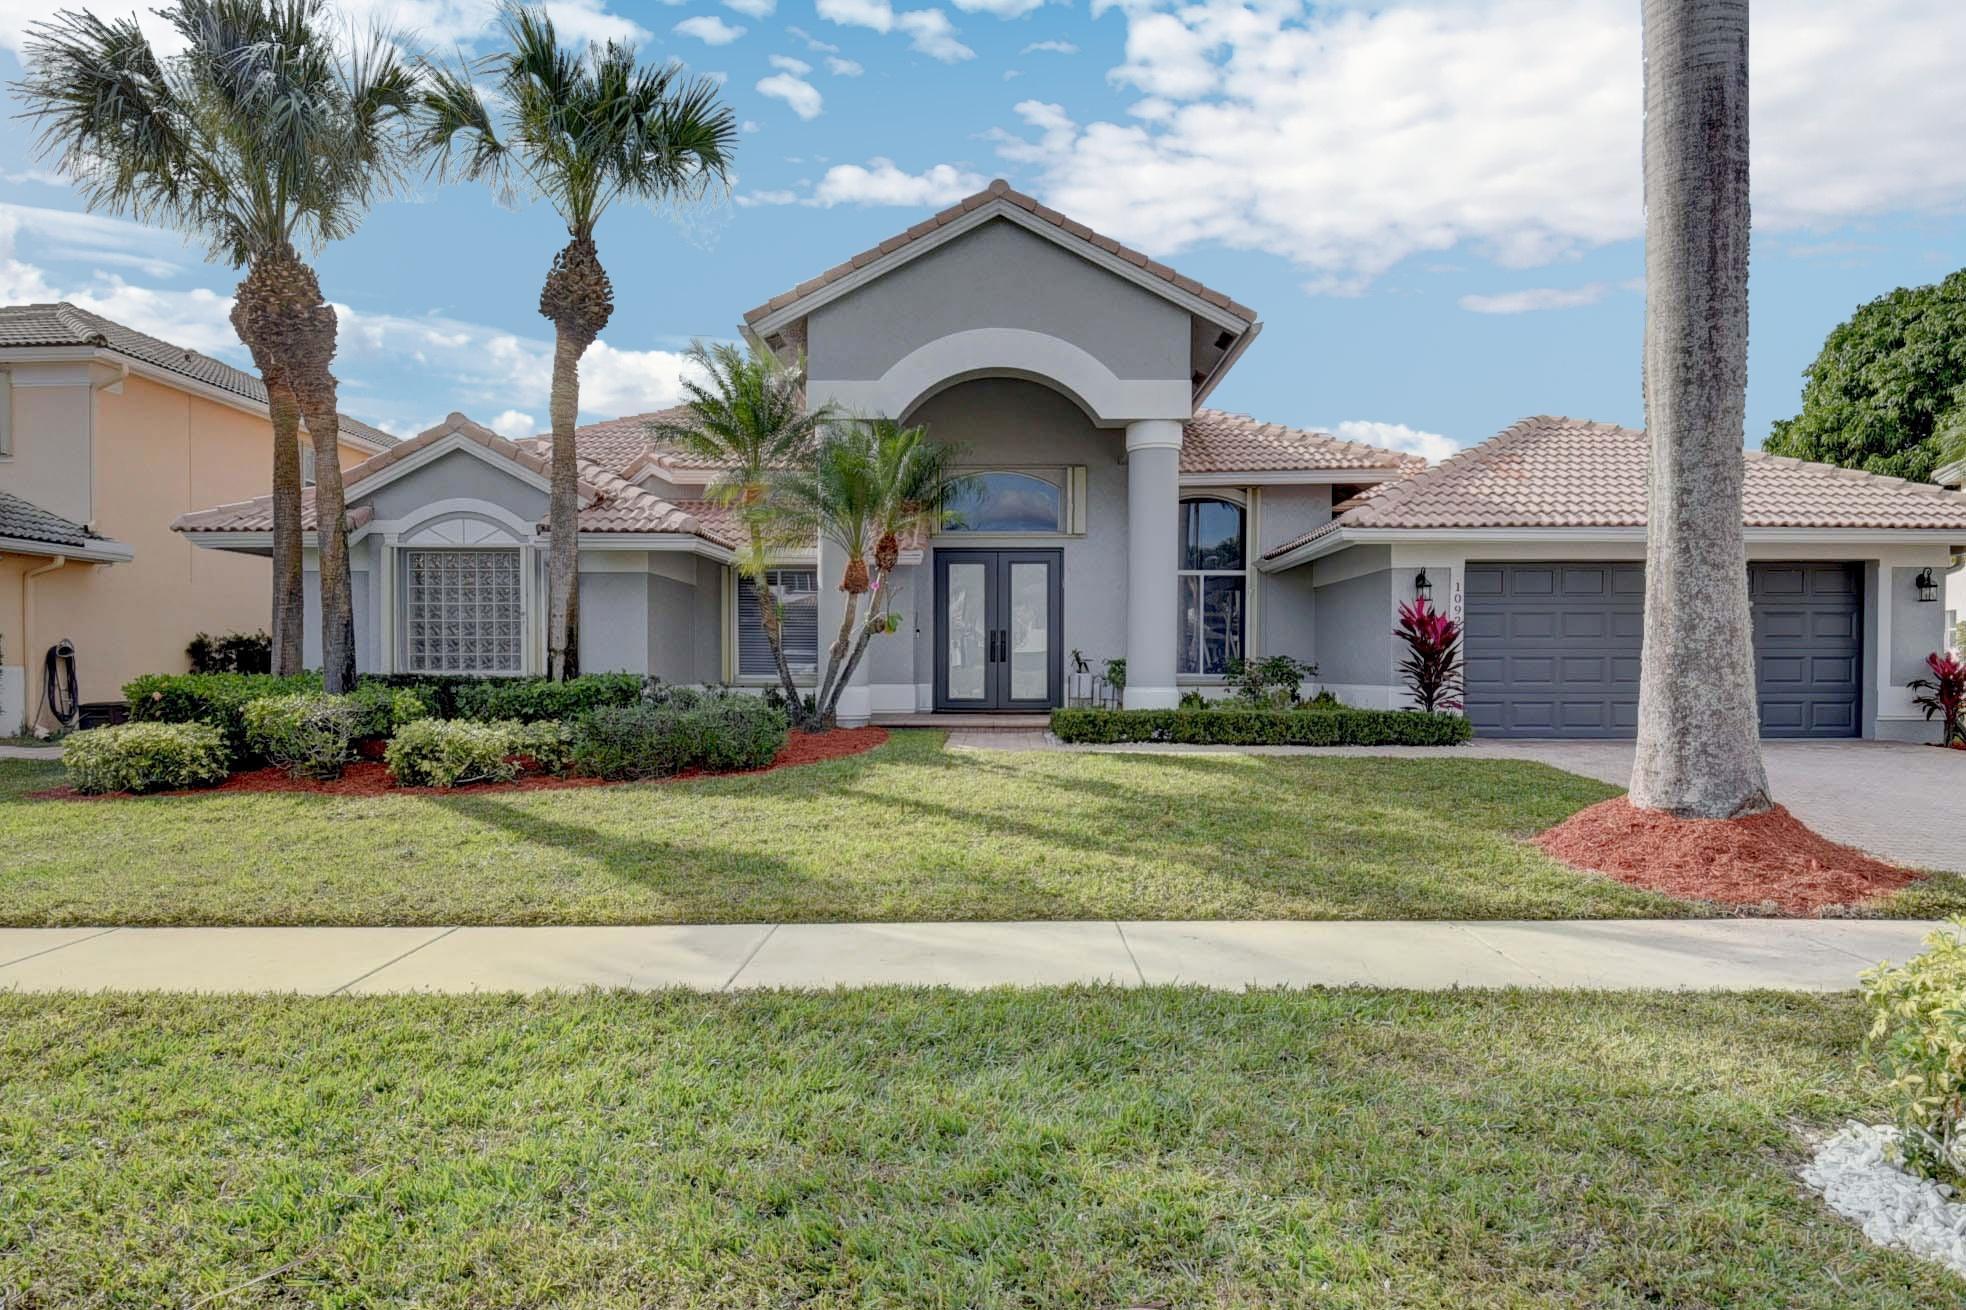 Home for sale in Boca Isles South Boca Raton Florida